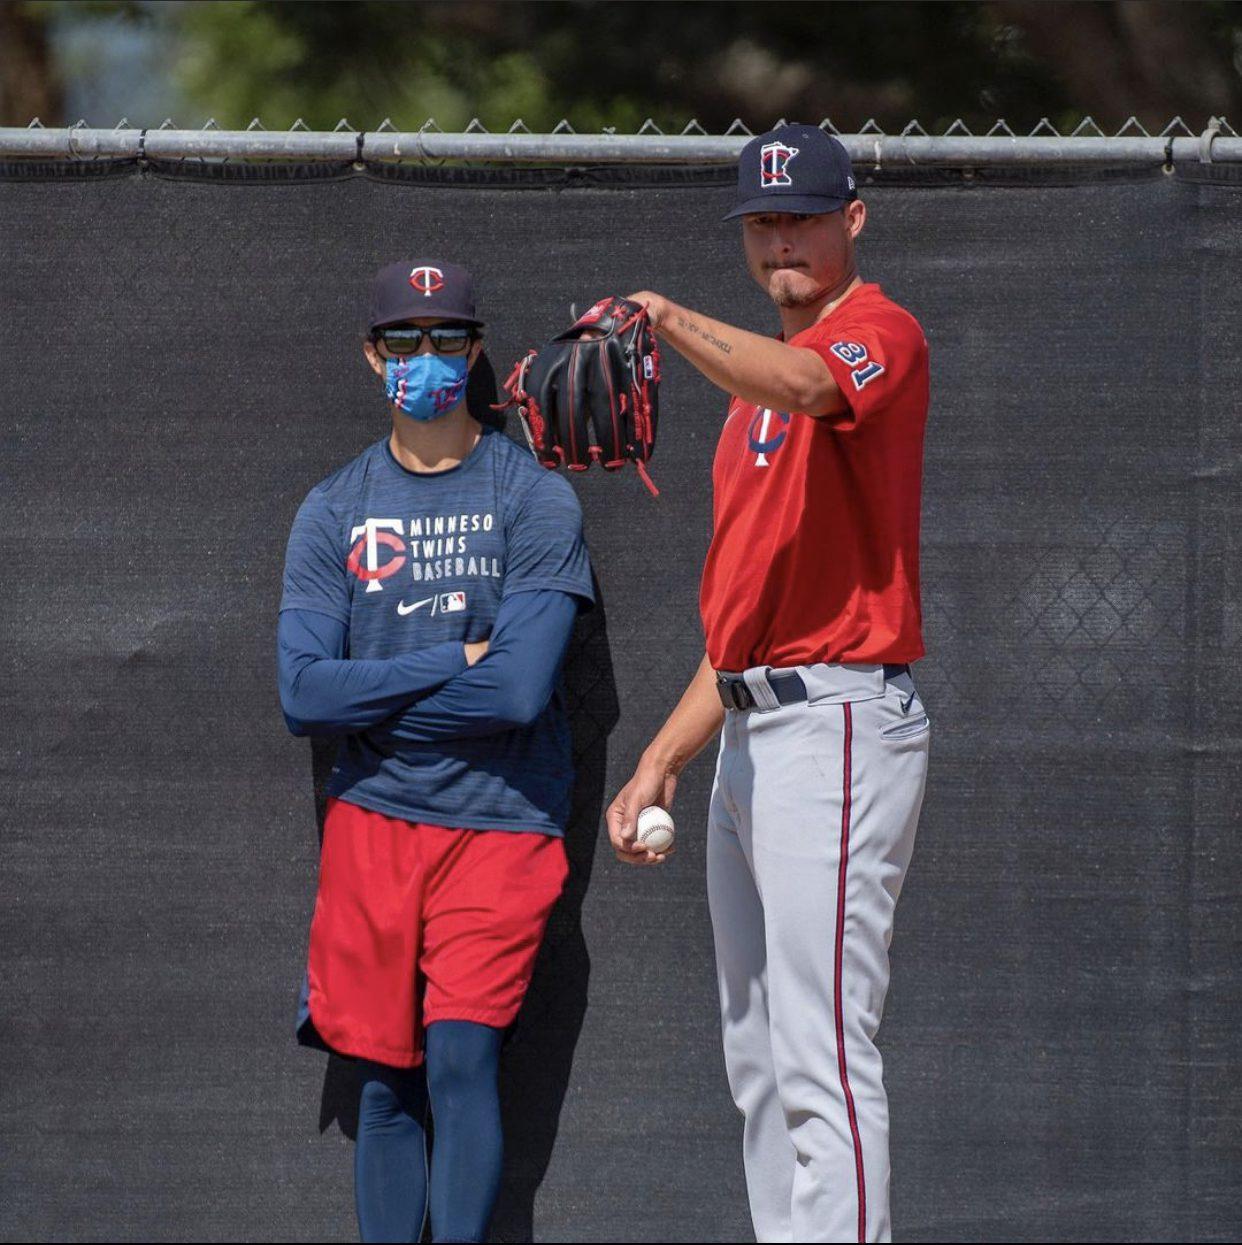 Anders Dzurak '13 (left) works with pitcher Jordan Balazovic this spring.